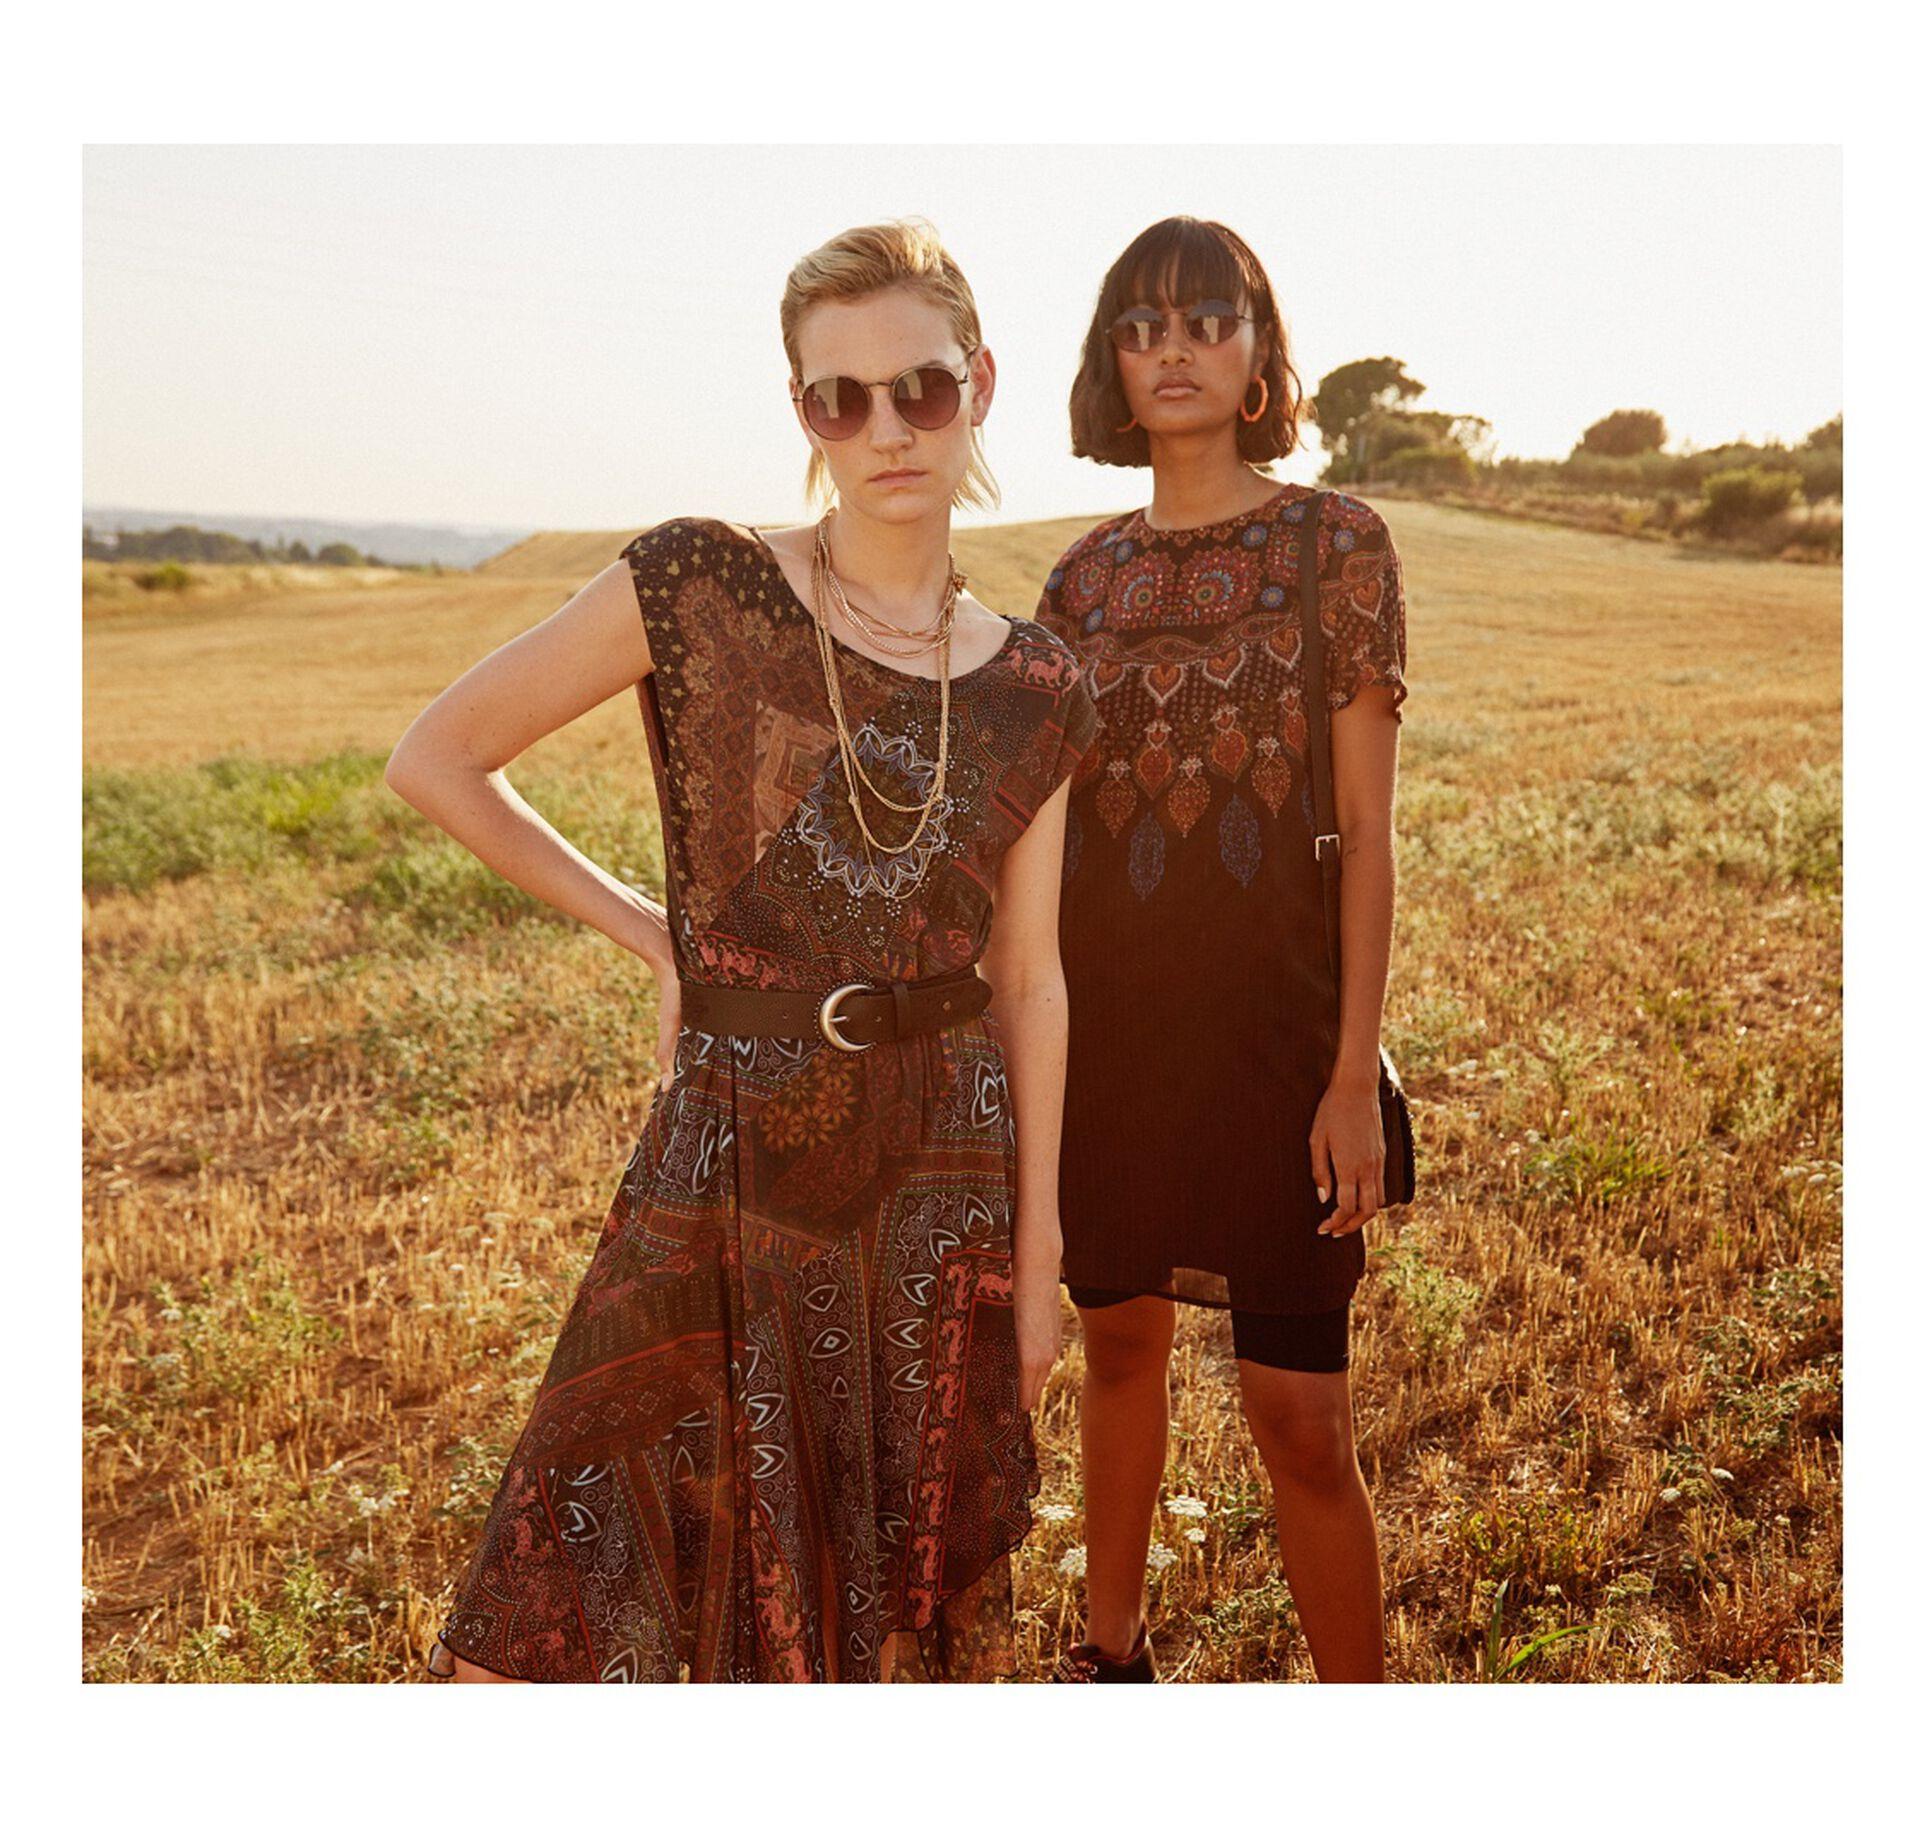 b015768001e2 Desigual - Compra ropa original online